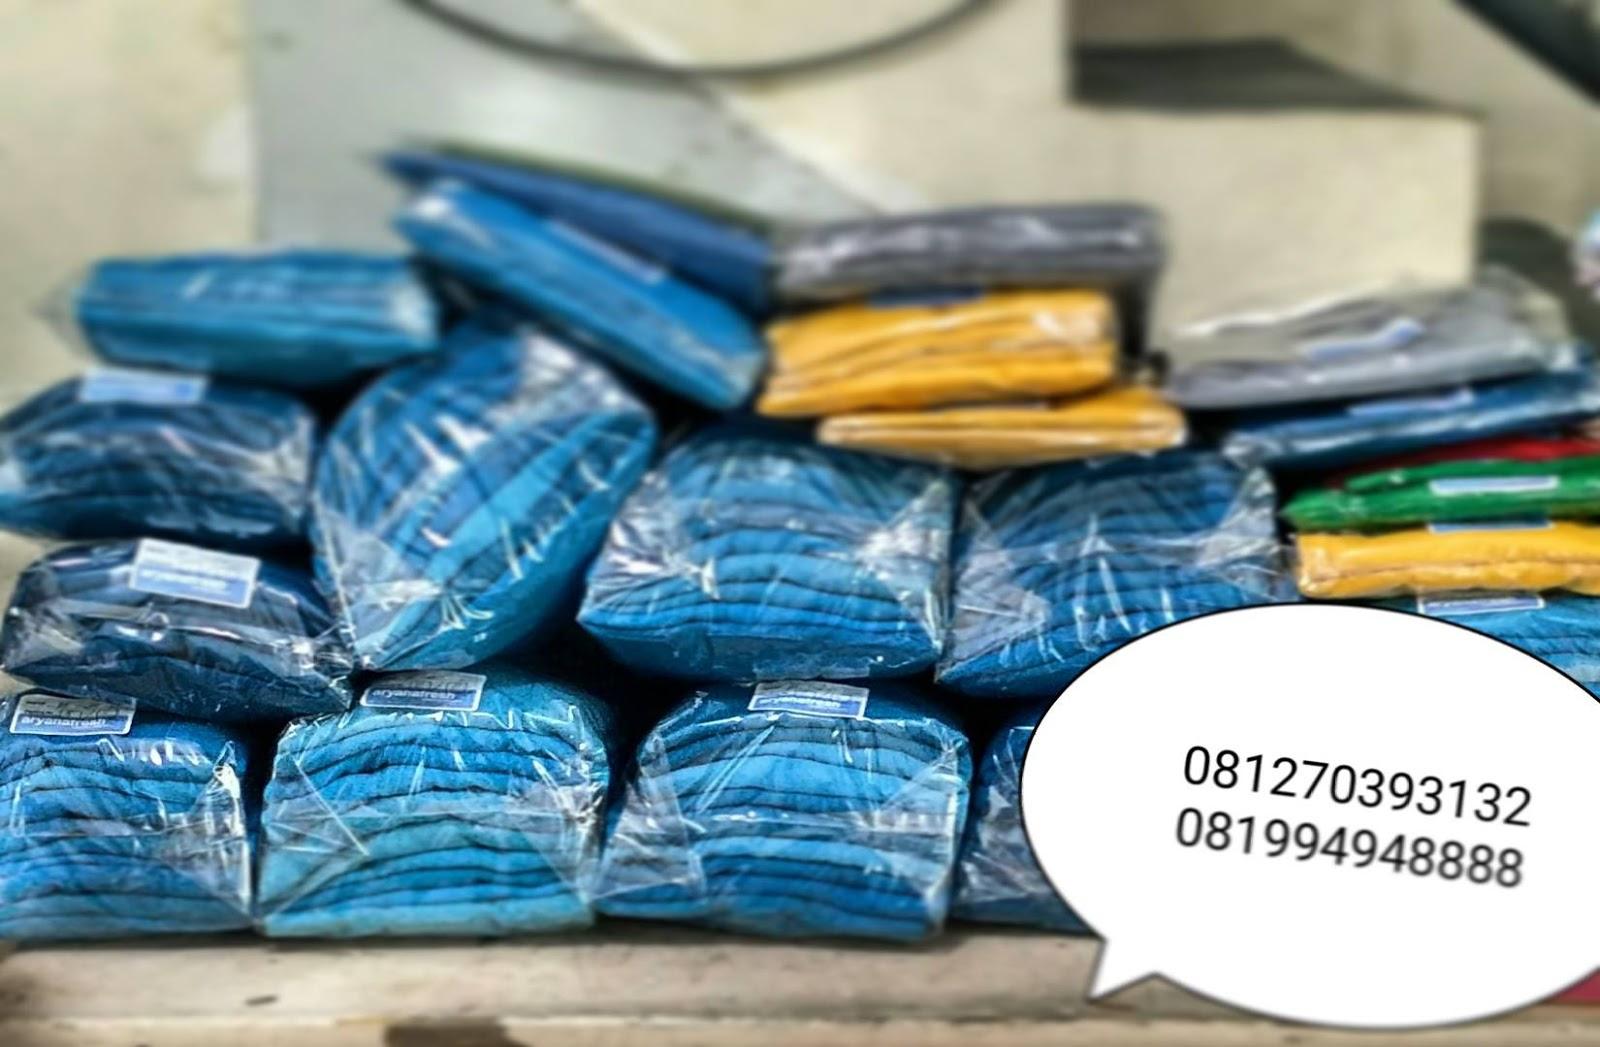 Laundry Kiloan Batam, Seragam Laundry, Uniform Laundry Expert